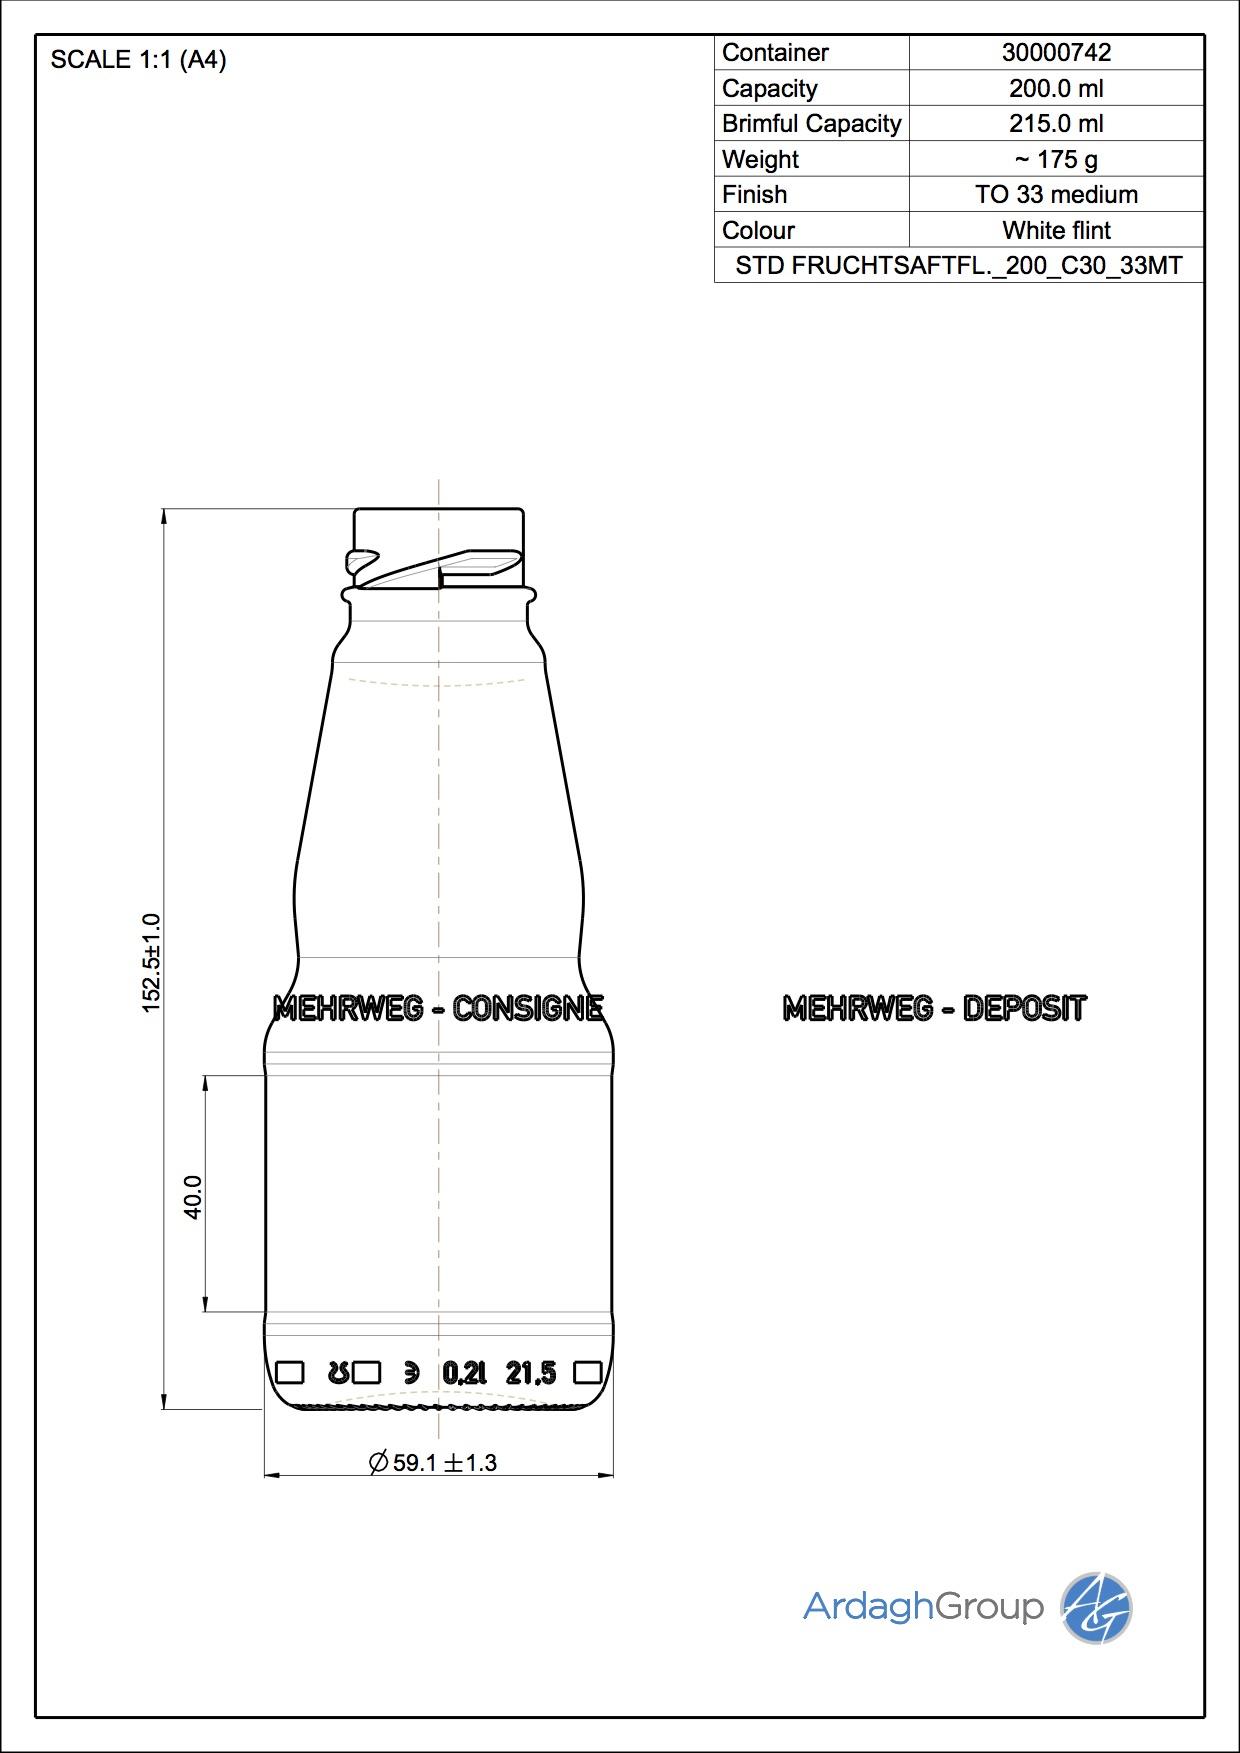 FRUCHTSAFTFL. 200 C30 33MT